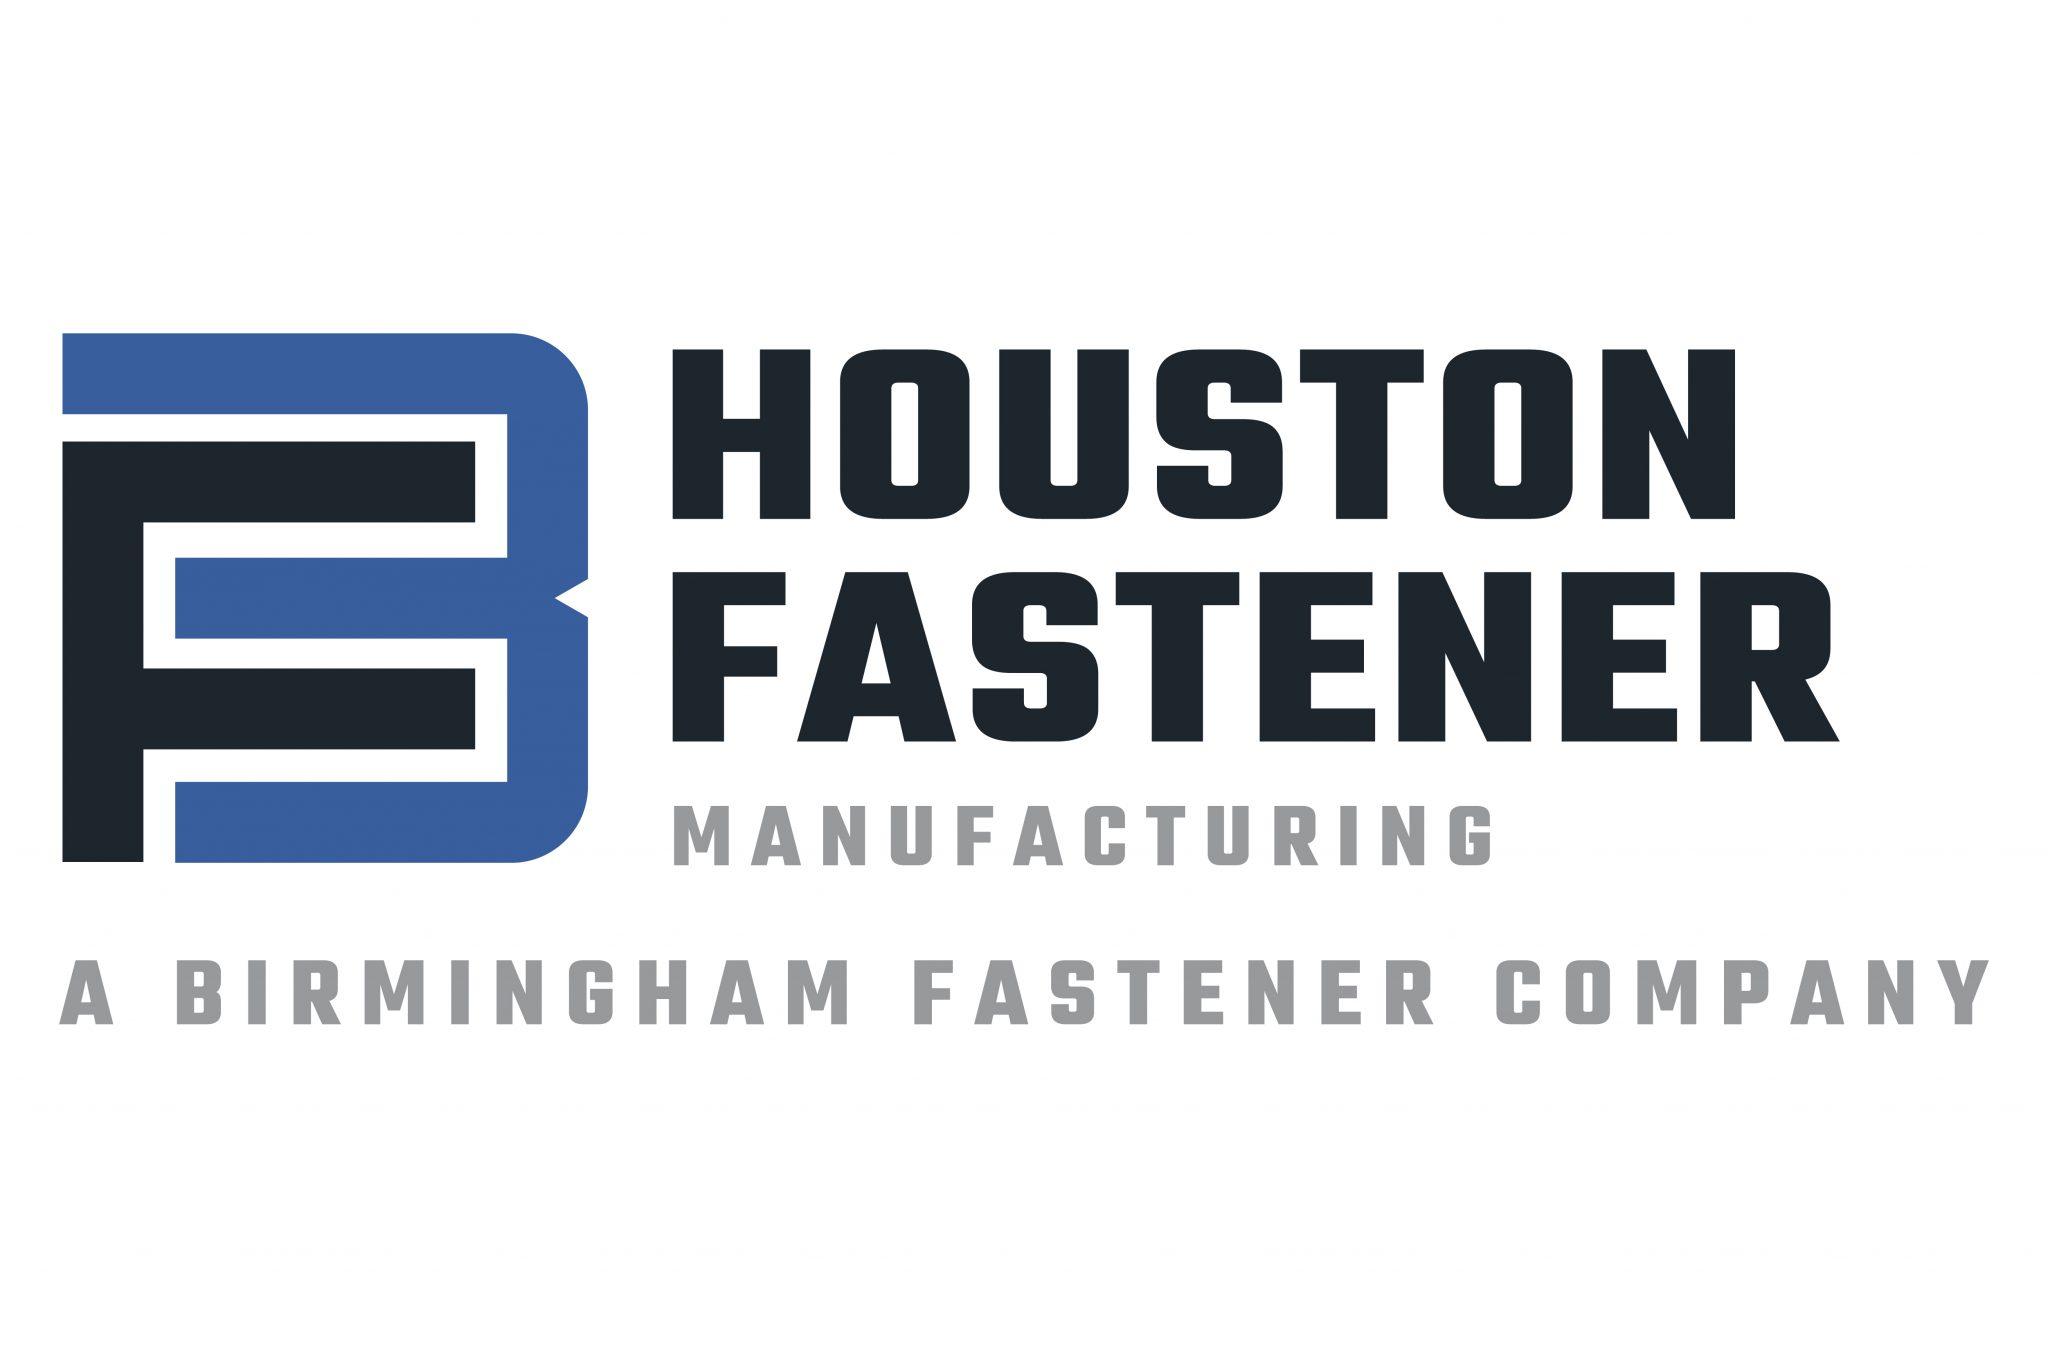 Birmingham Fastener Opens New Branch in Houston -